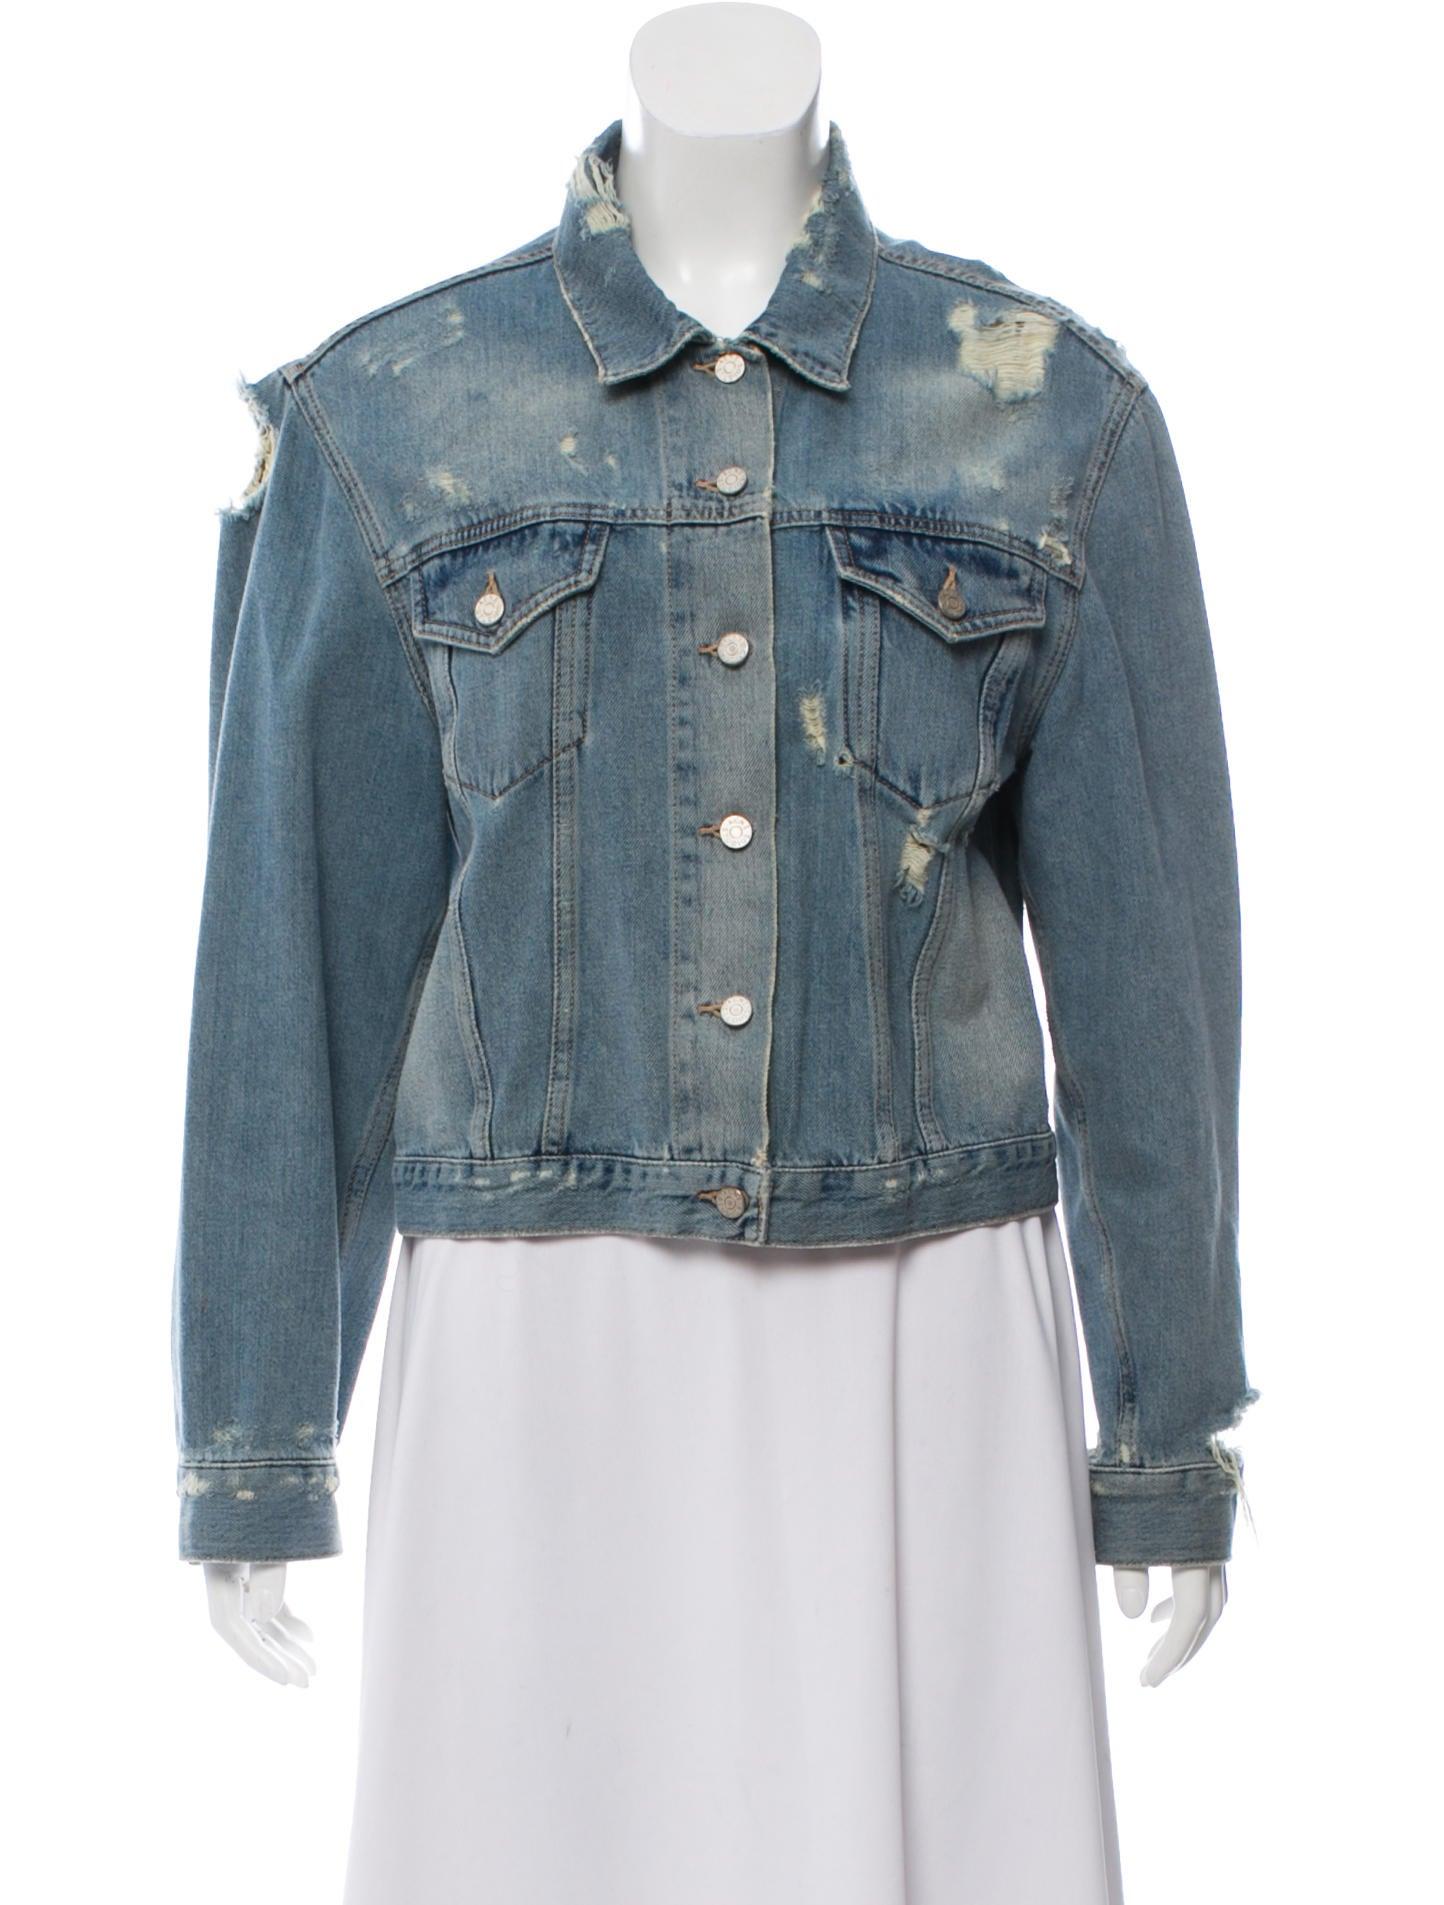 8de3d444e88 Acne Studios Distressed Denim Jacket - Clothing - ACN40515